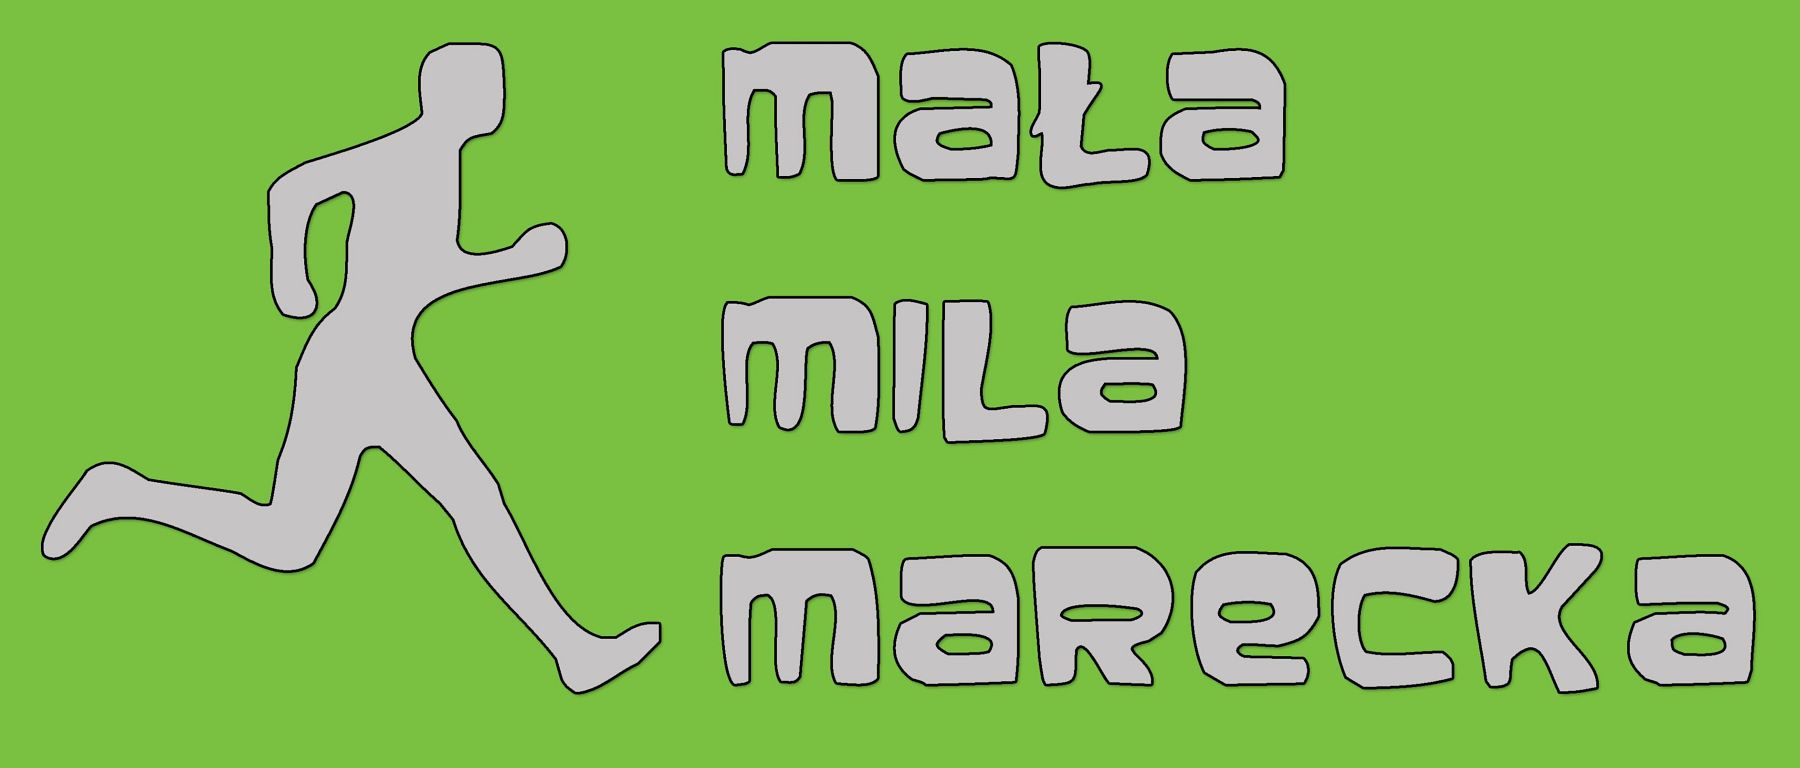 ma?a mila marecka wodoci?g marecki - koszulki - 2016-08-09.cdr